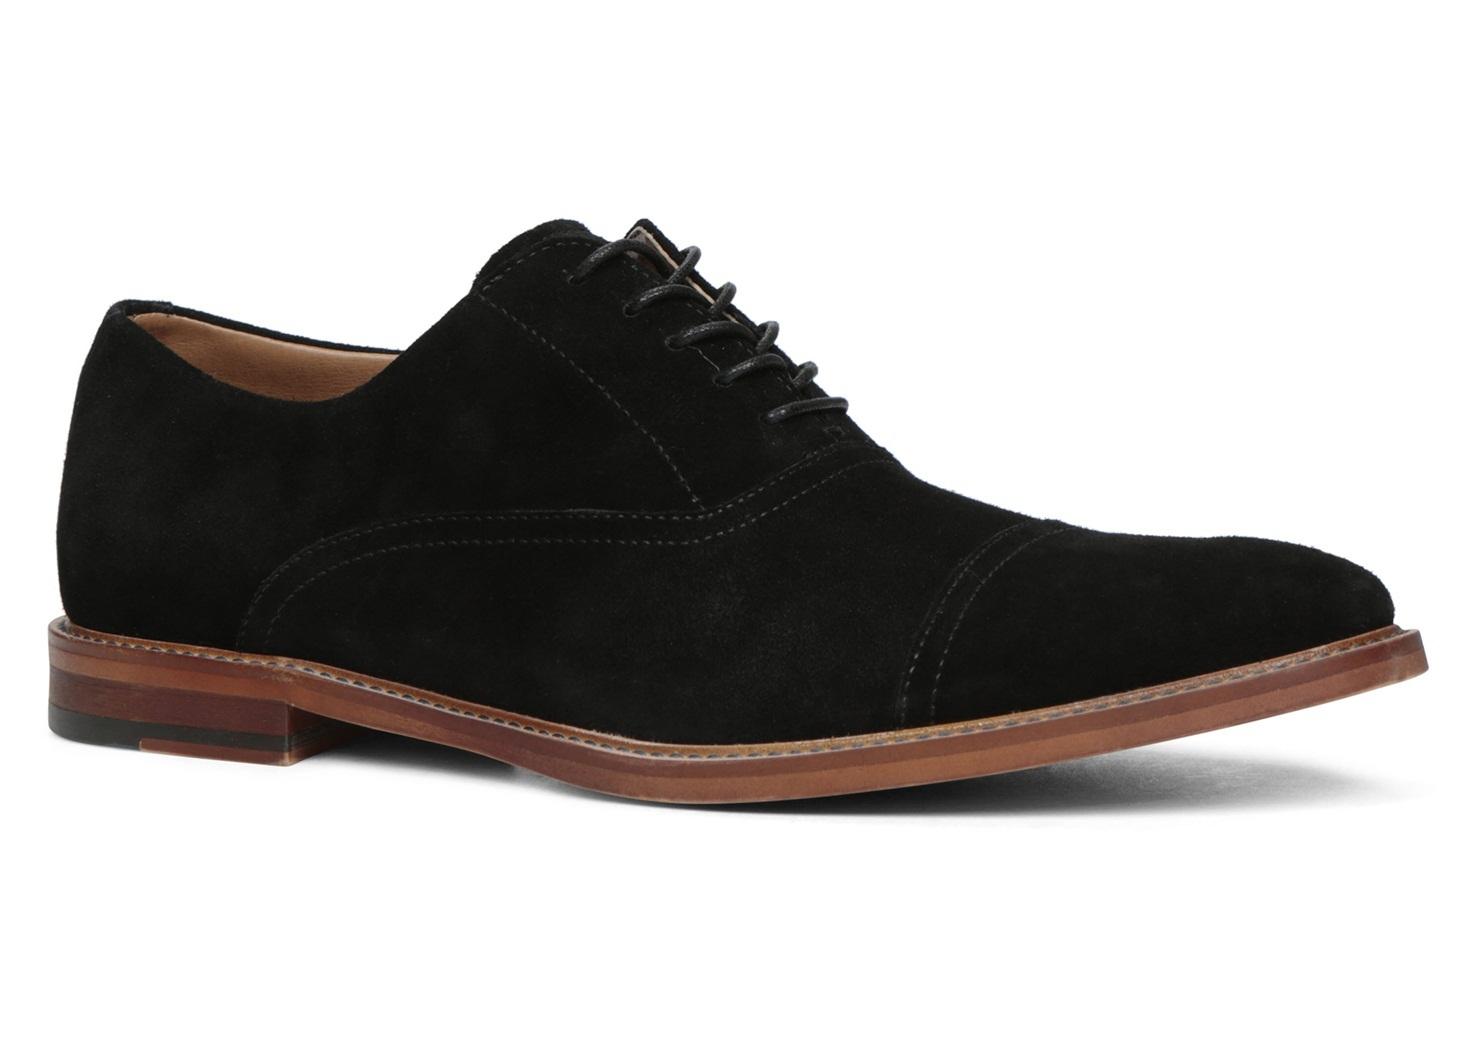 Handmade Mens Oxford Black Suede Leather Shoes Men Formal